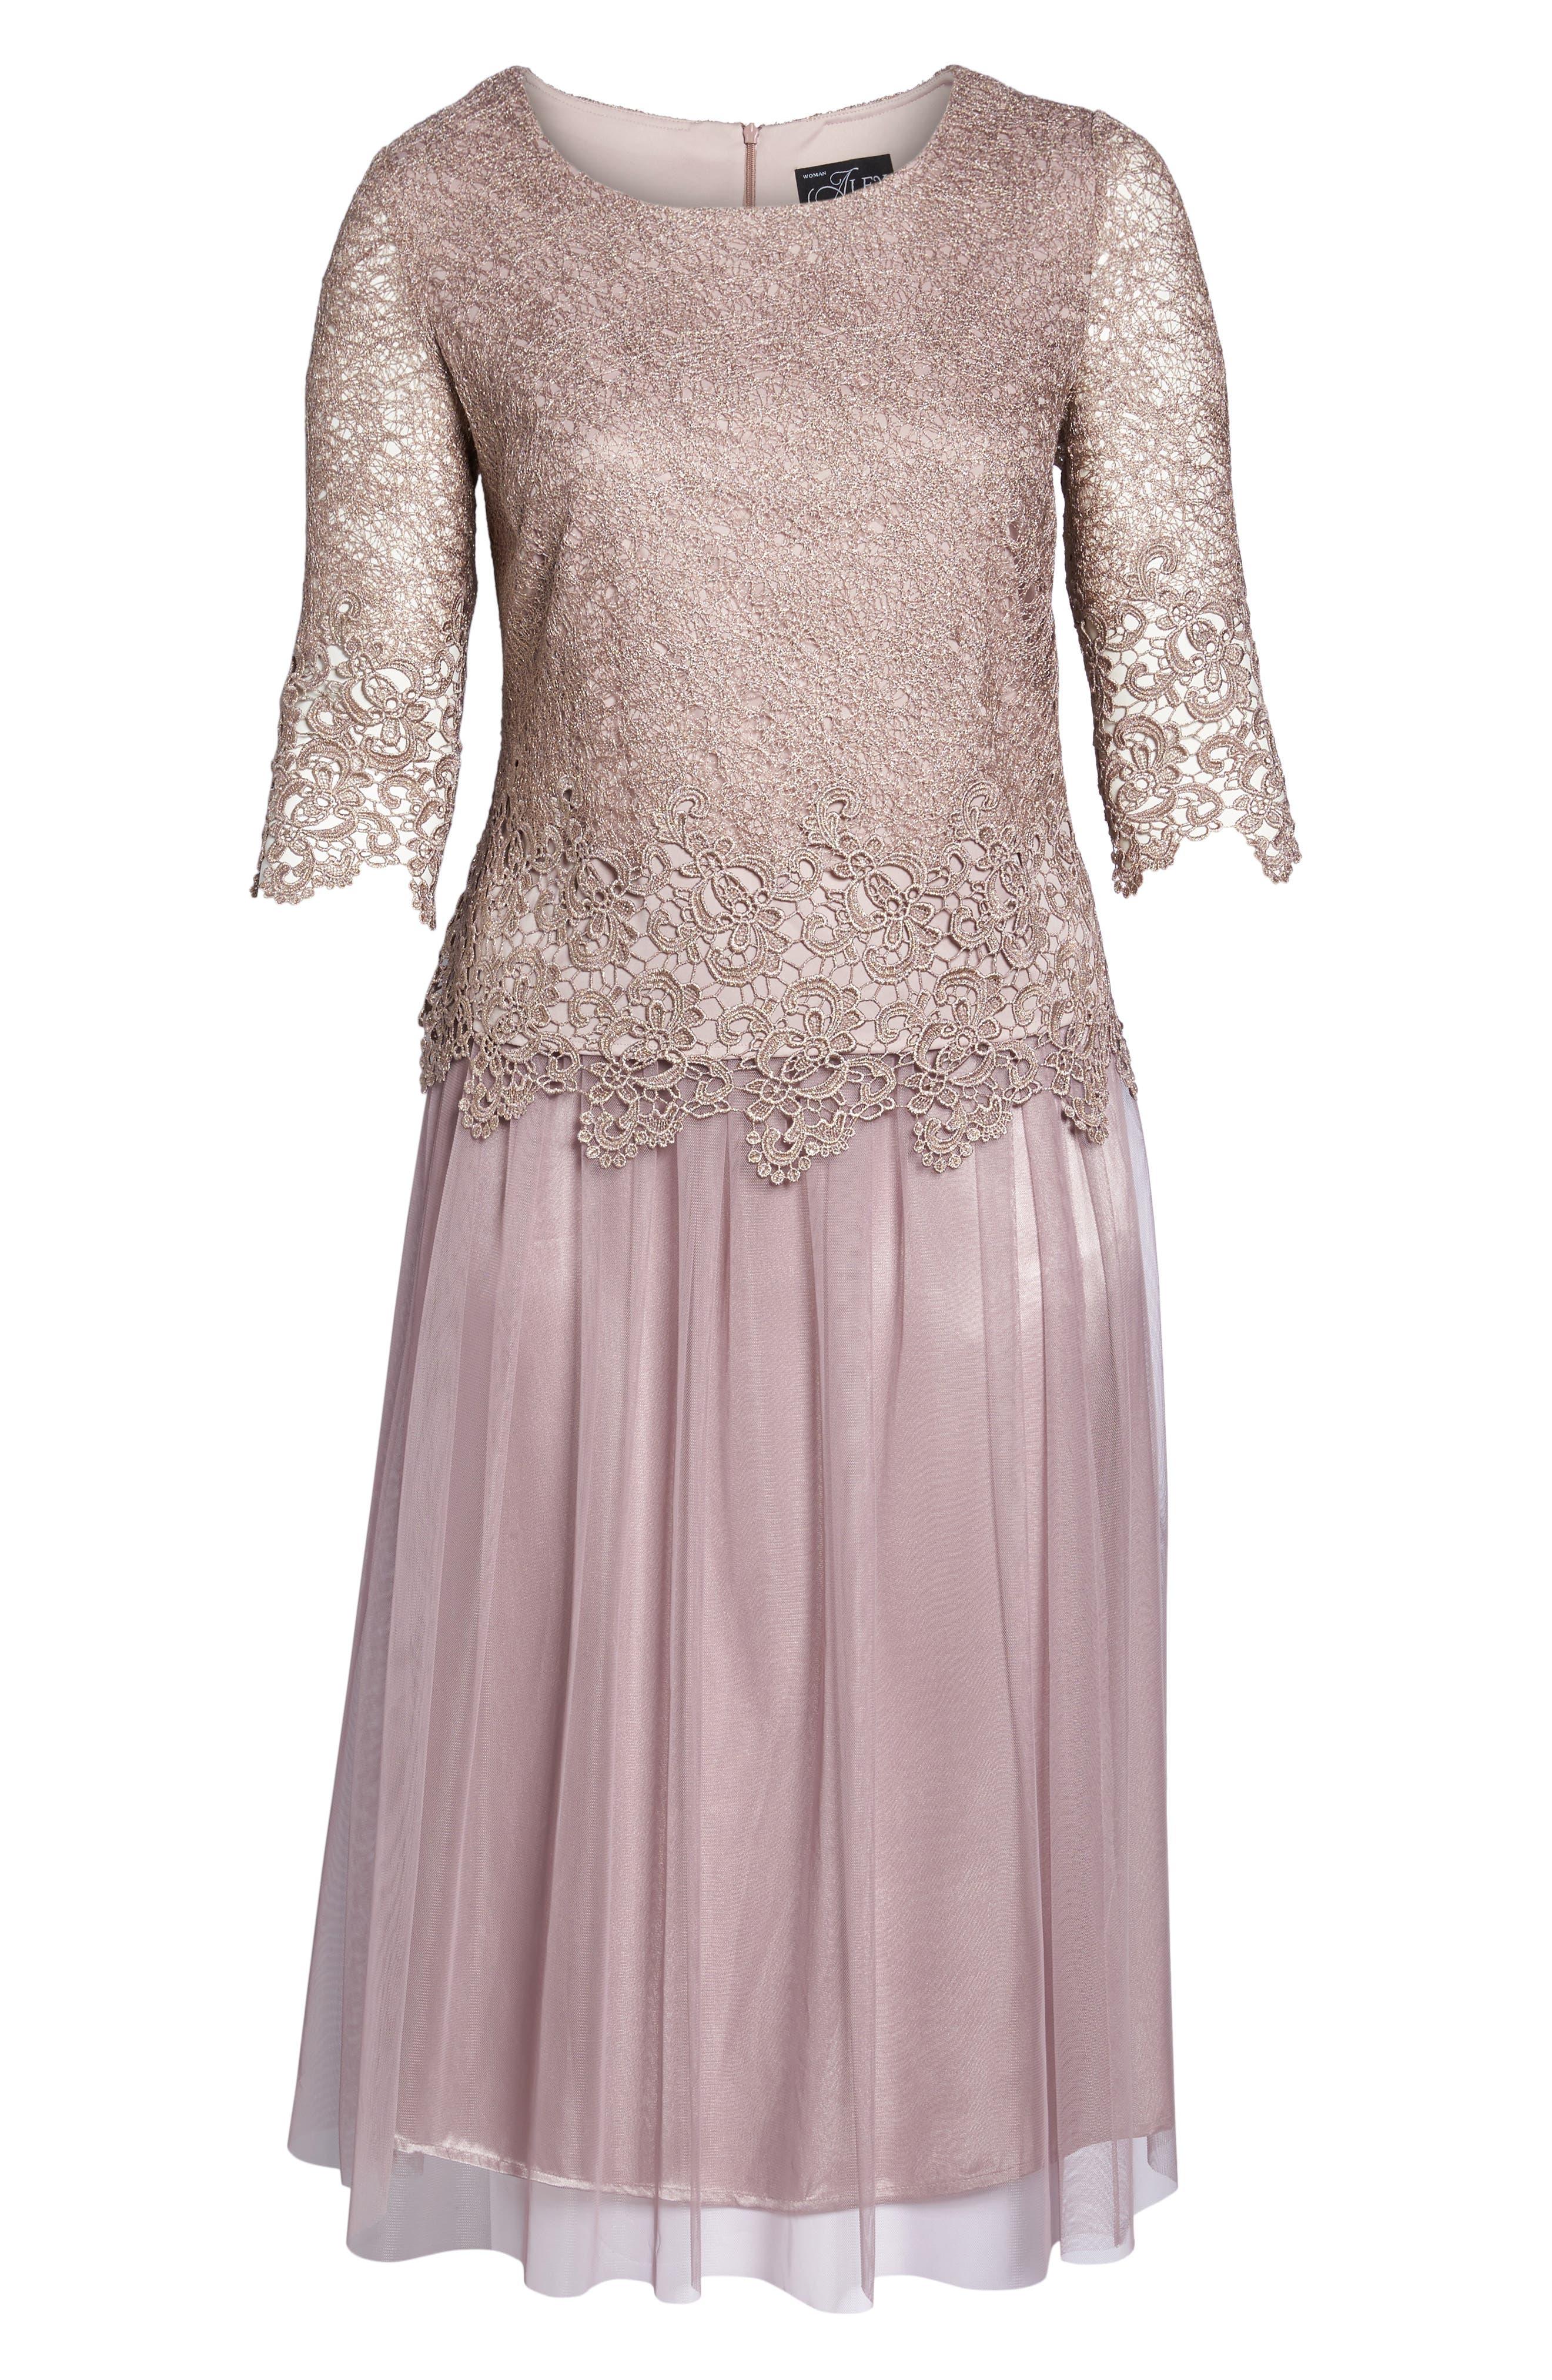 Embellished Mock Two-Piece Tea Length Dress,                             Alternate thumbnail 6, color,                             Rose